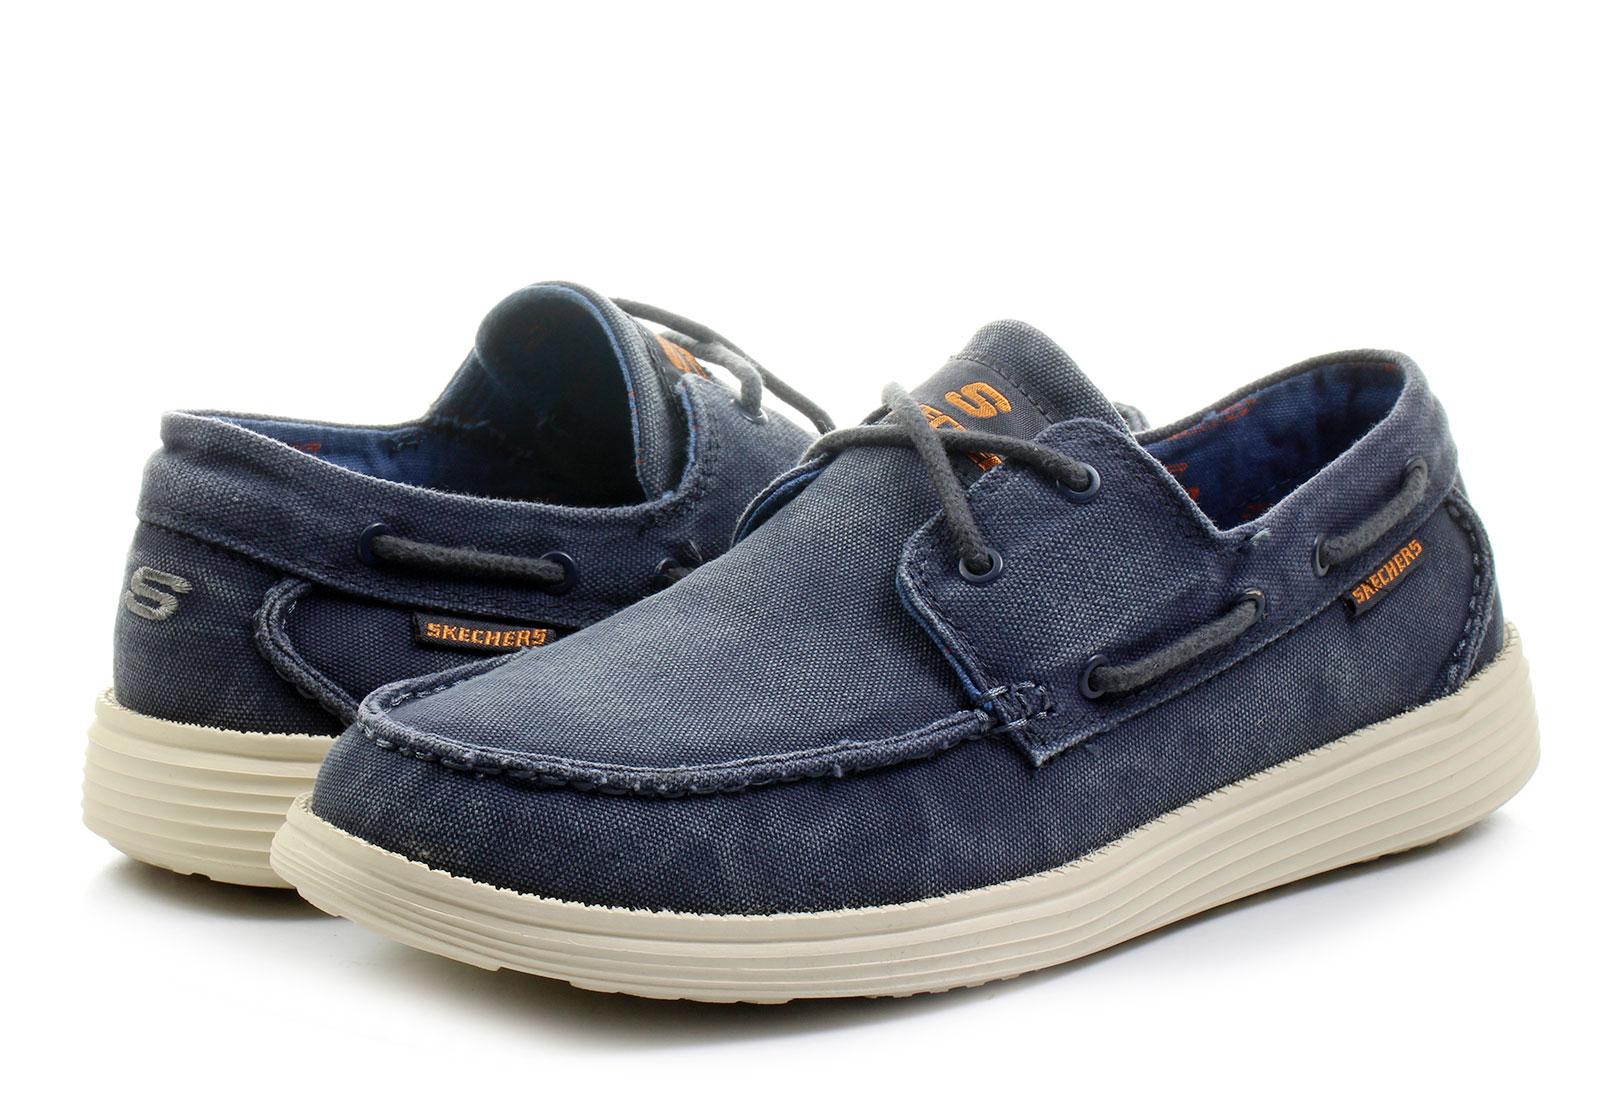 Skechers Shoes - Status - Melec - 64644-nvy - Online shop